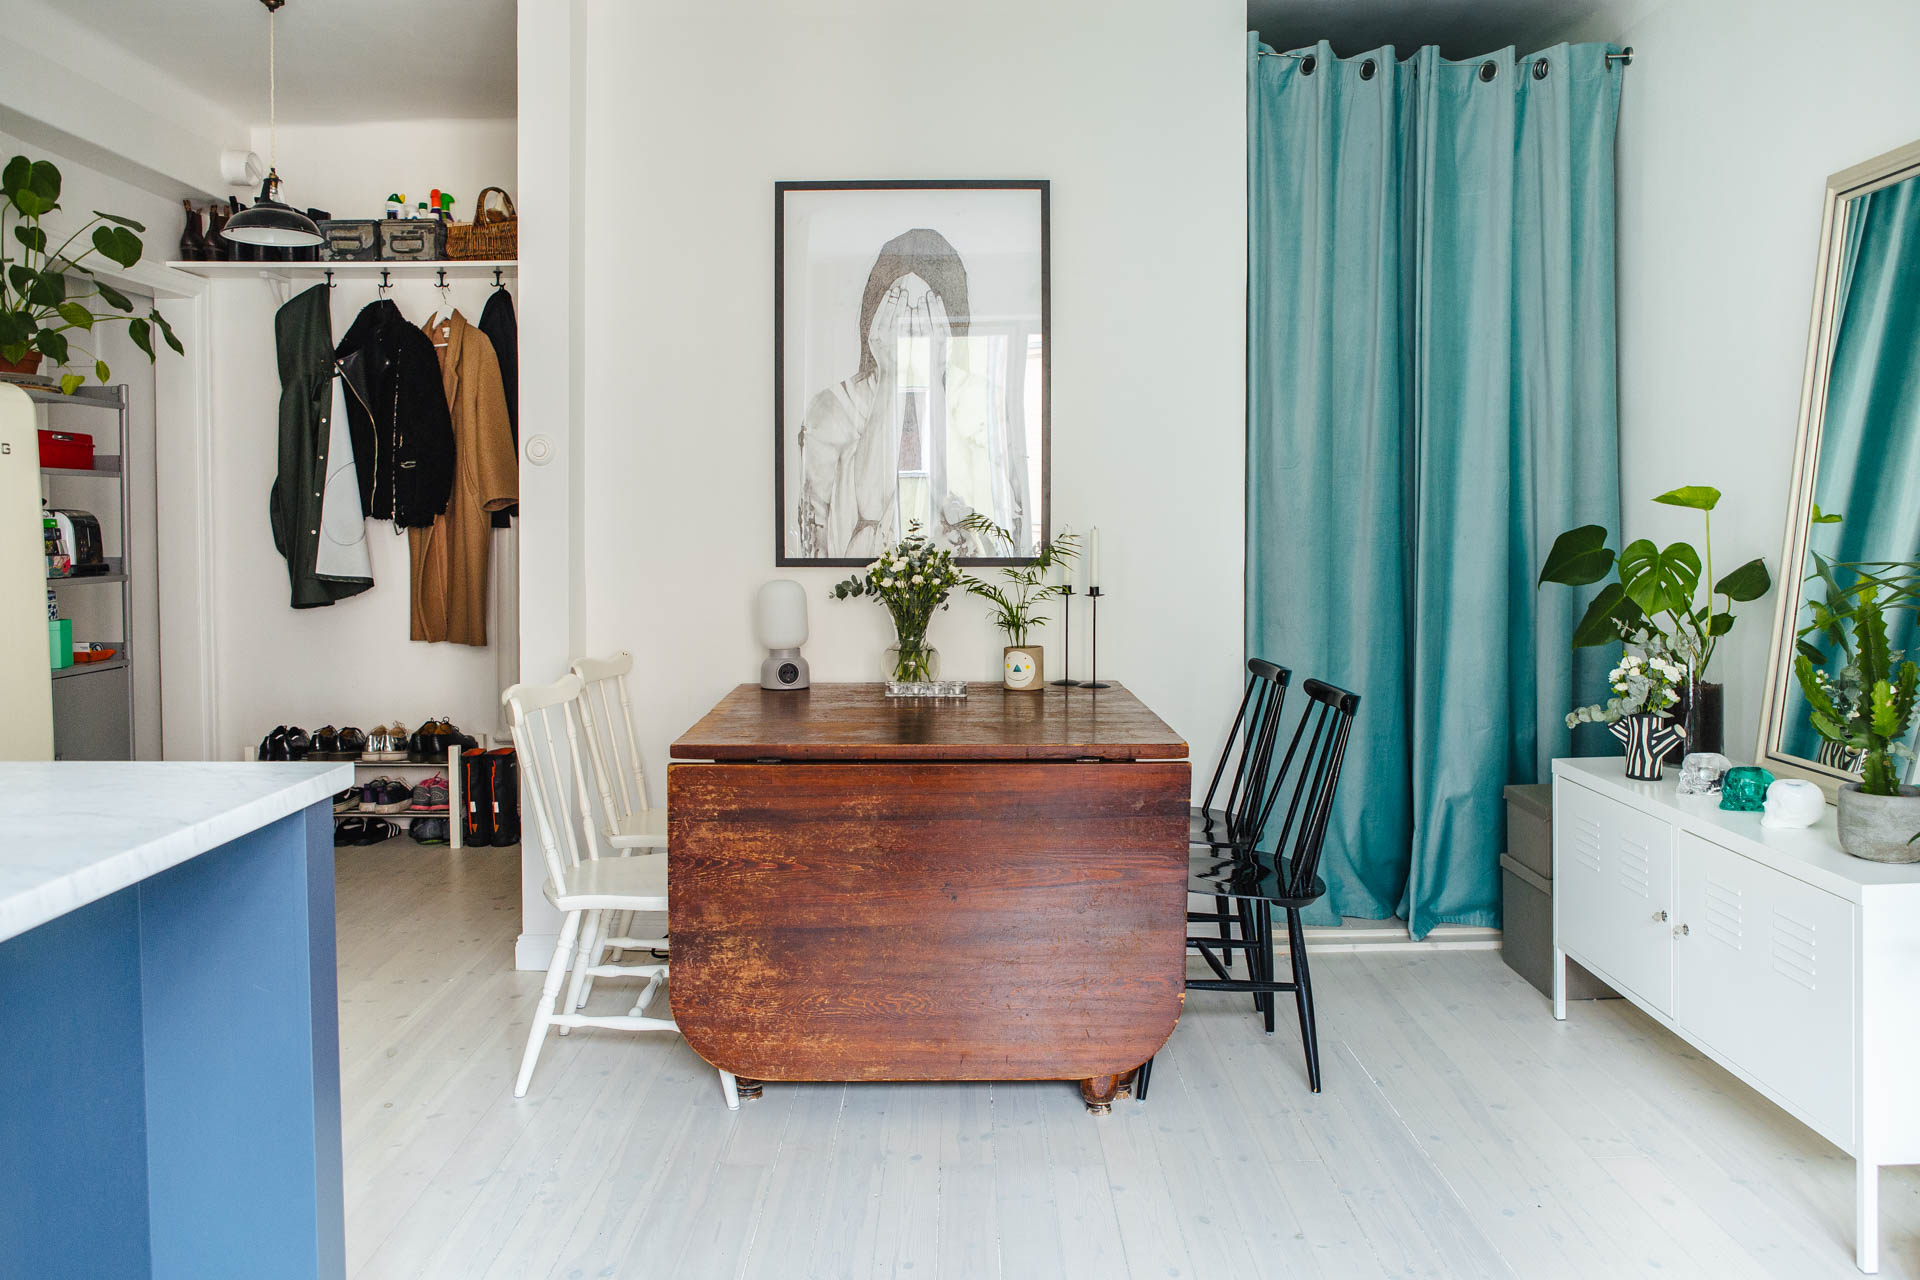 uitklapbare-eettafel-klein-appartement